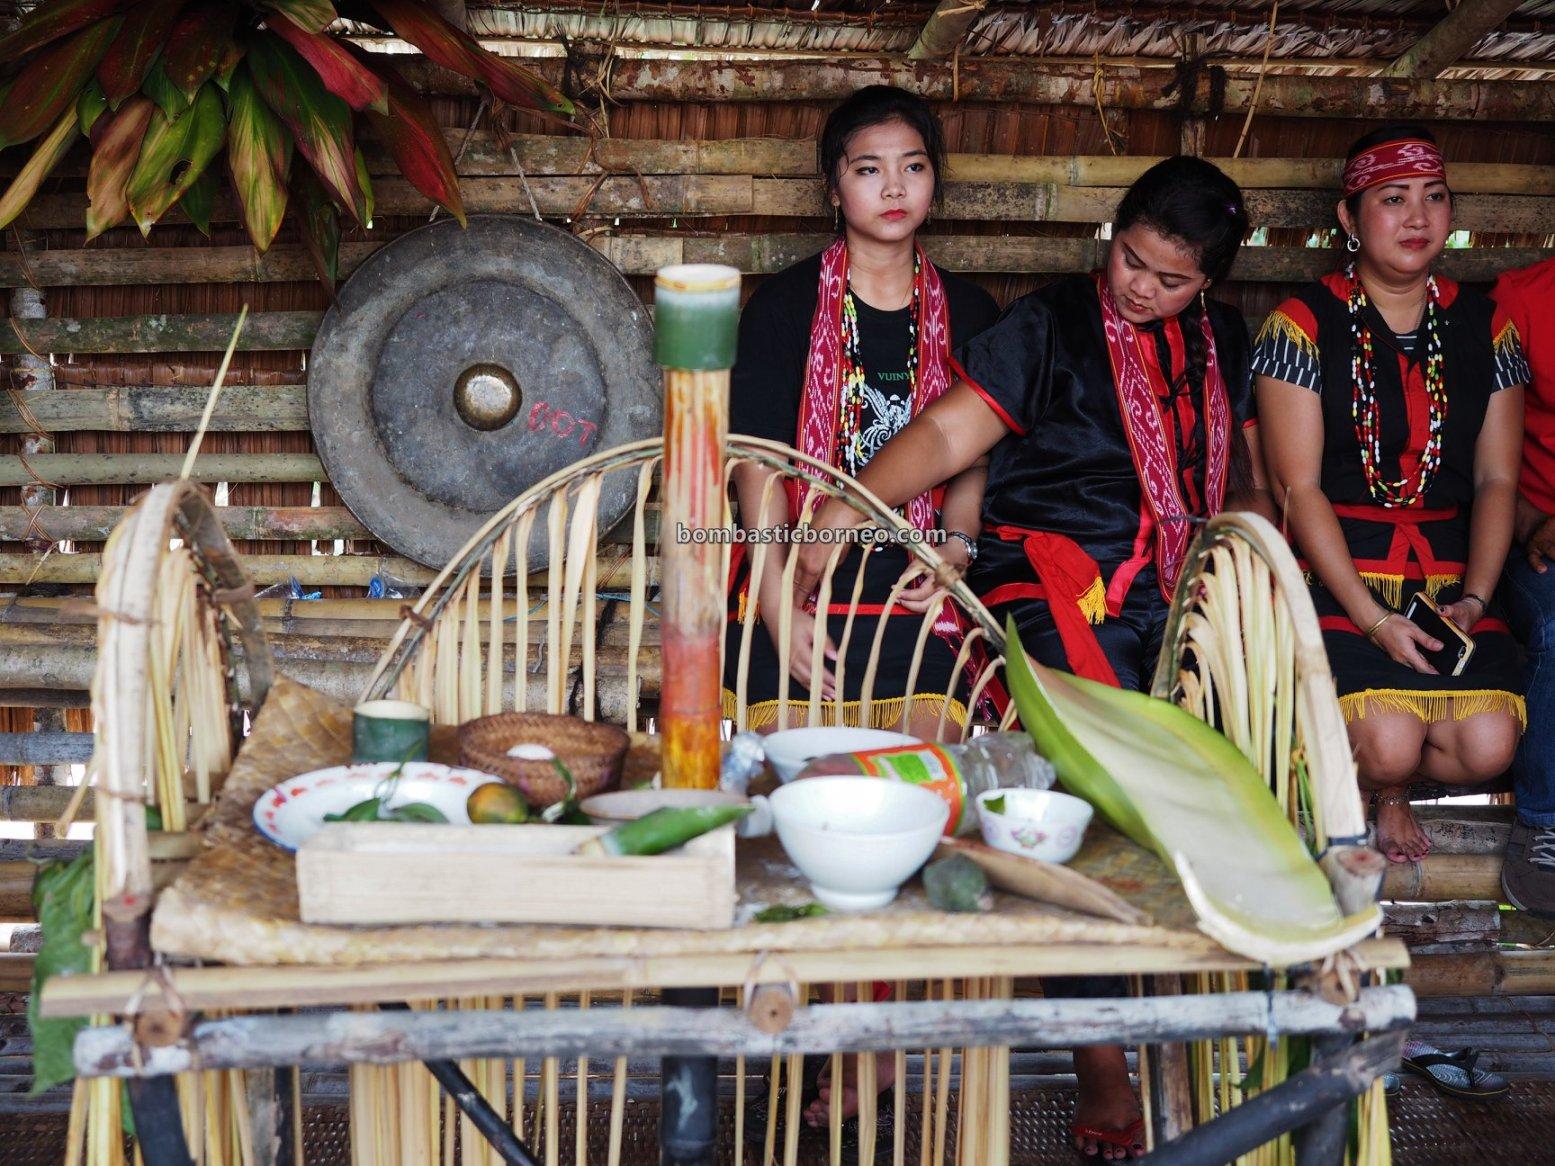 Harvest Festival, traditional, ritual, ceremony, Indonesia, native, tribe, tribal, tourism, tourist attraction, travel guide, Cross Border, Borneo, 印尼西加里曼丹, 原住民传统丰收节. 婆罗洲比达友部落